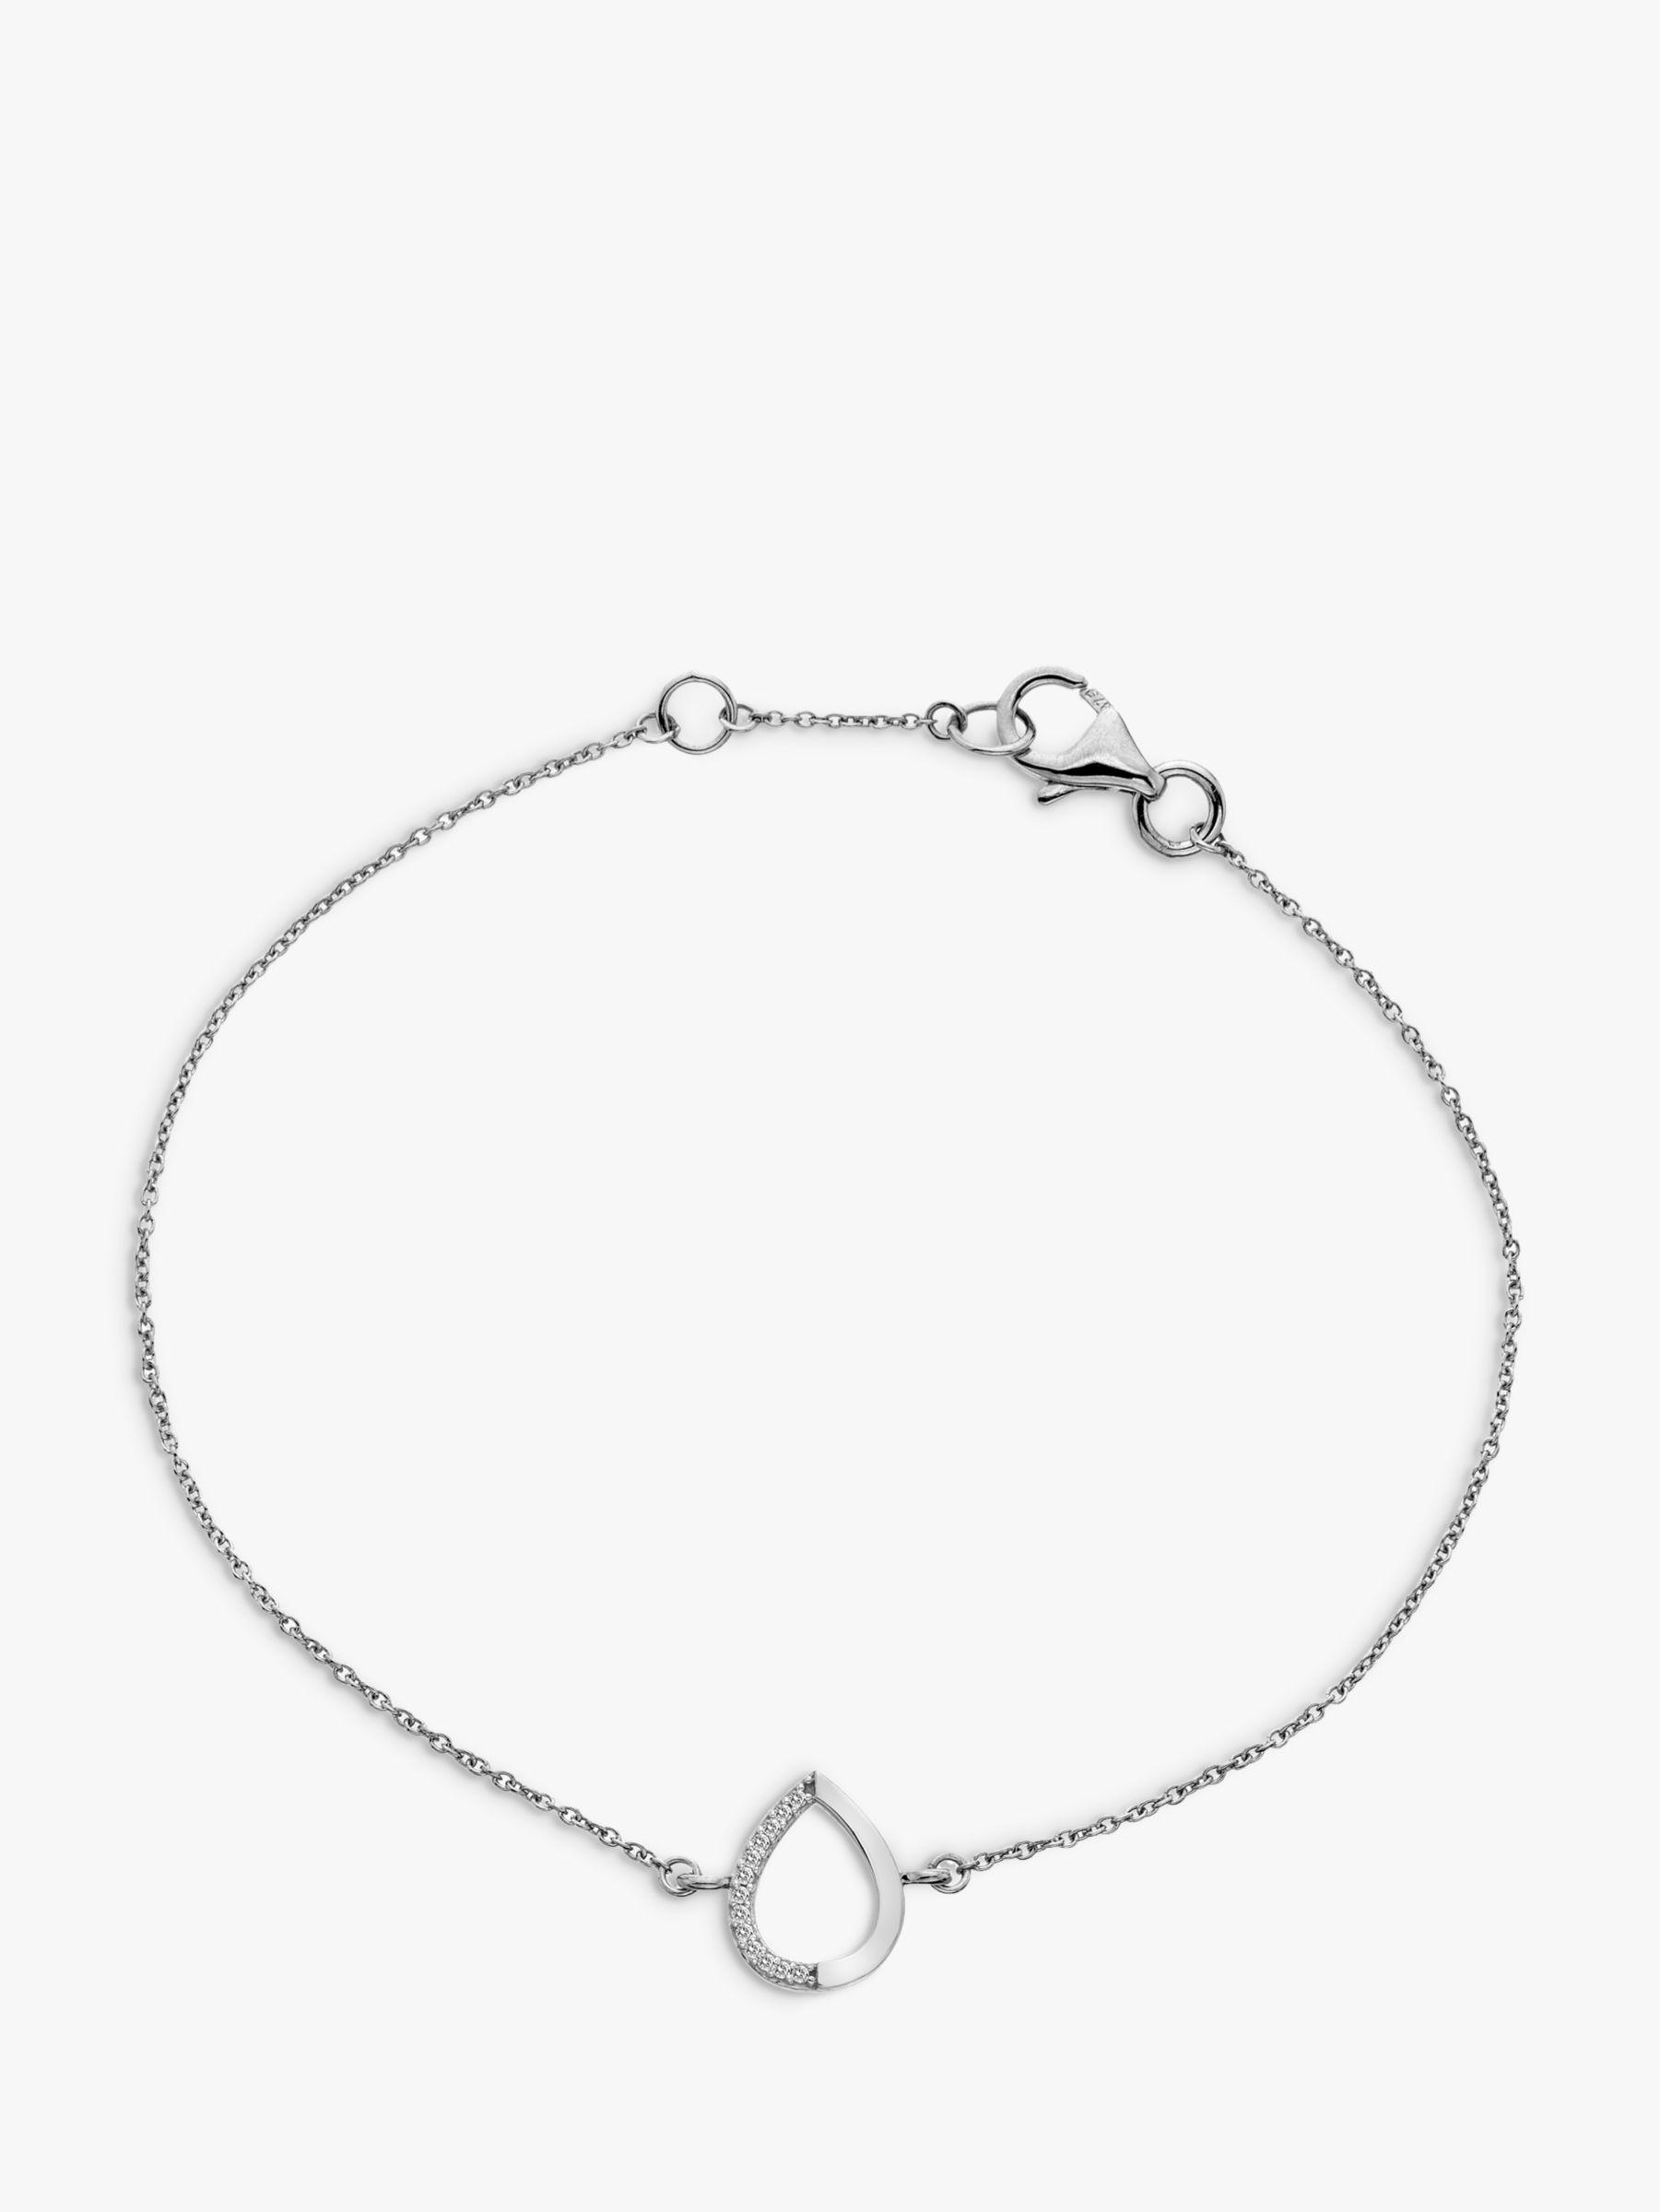 Hot Diamonds Hot Diamonds 9ct White Gold Teardrop Chain Bracelet